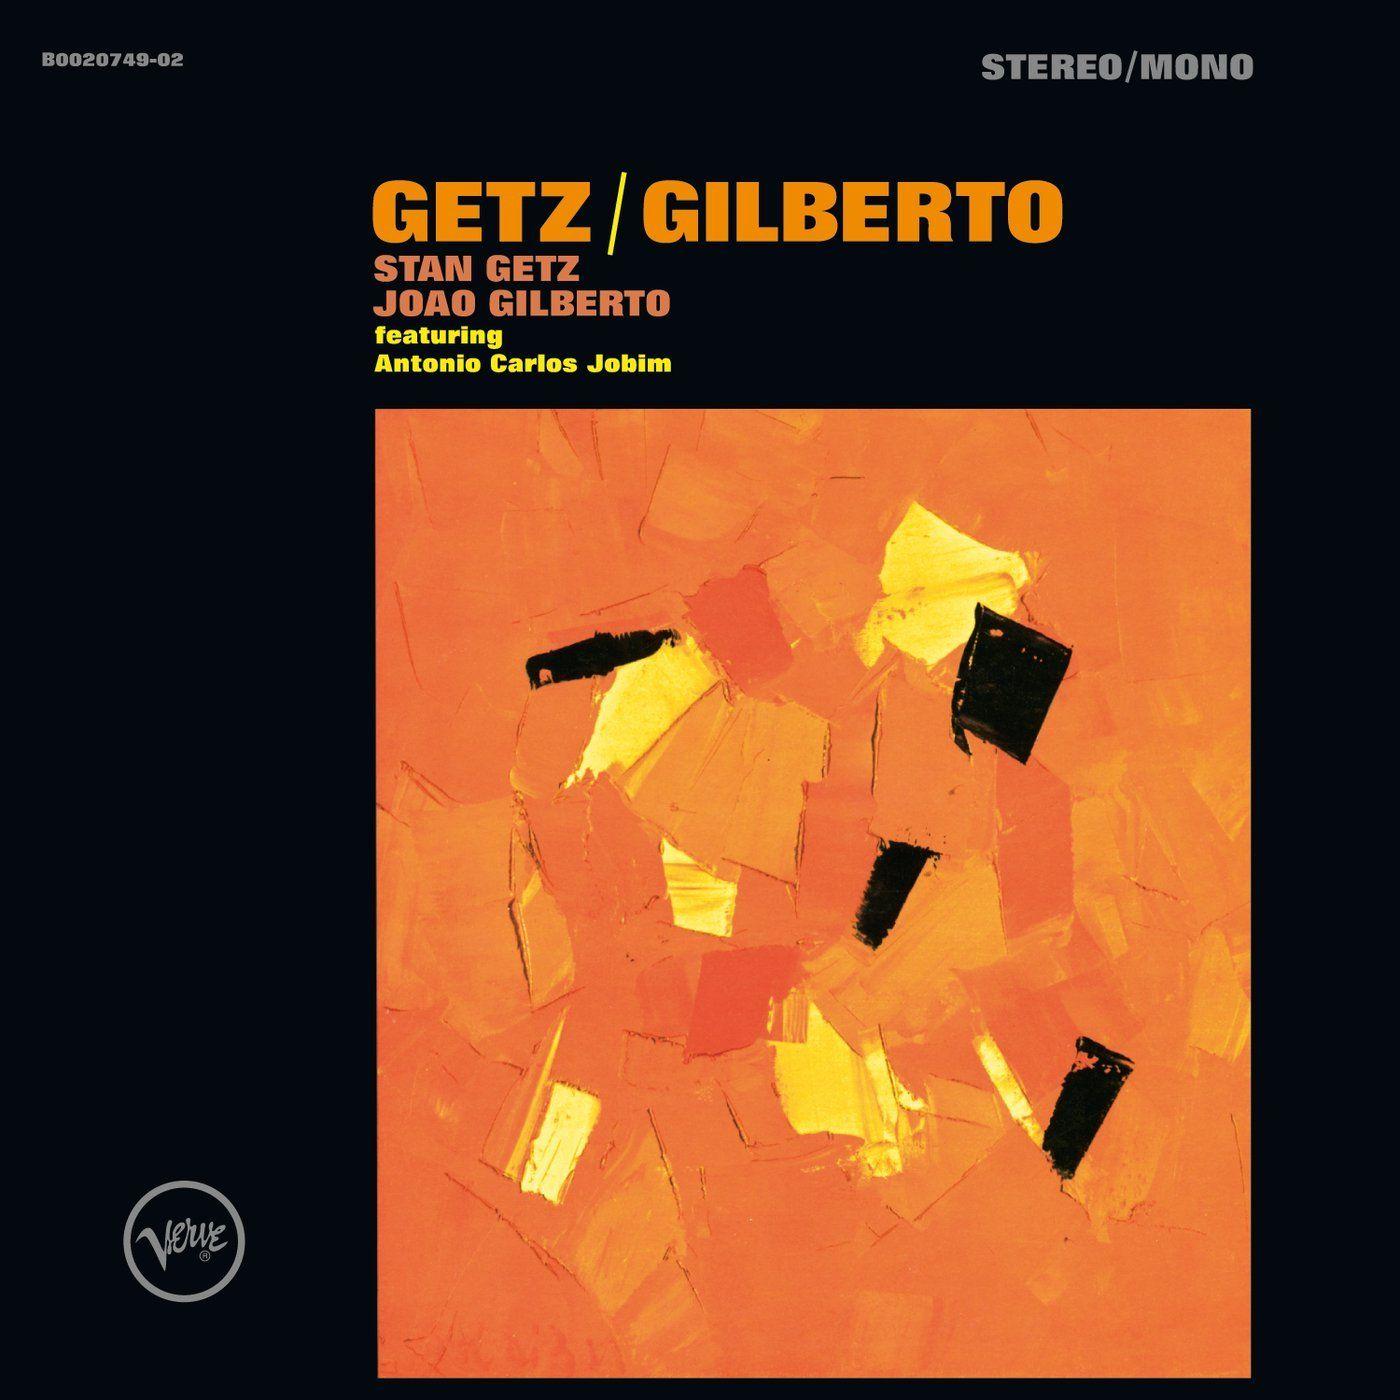 Getz Gilberto Stan Getz Jazz Guitar Chords Classic Album Covers